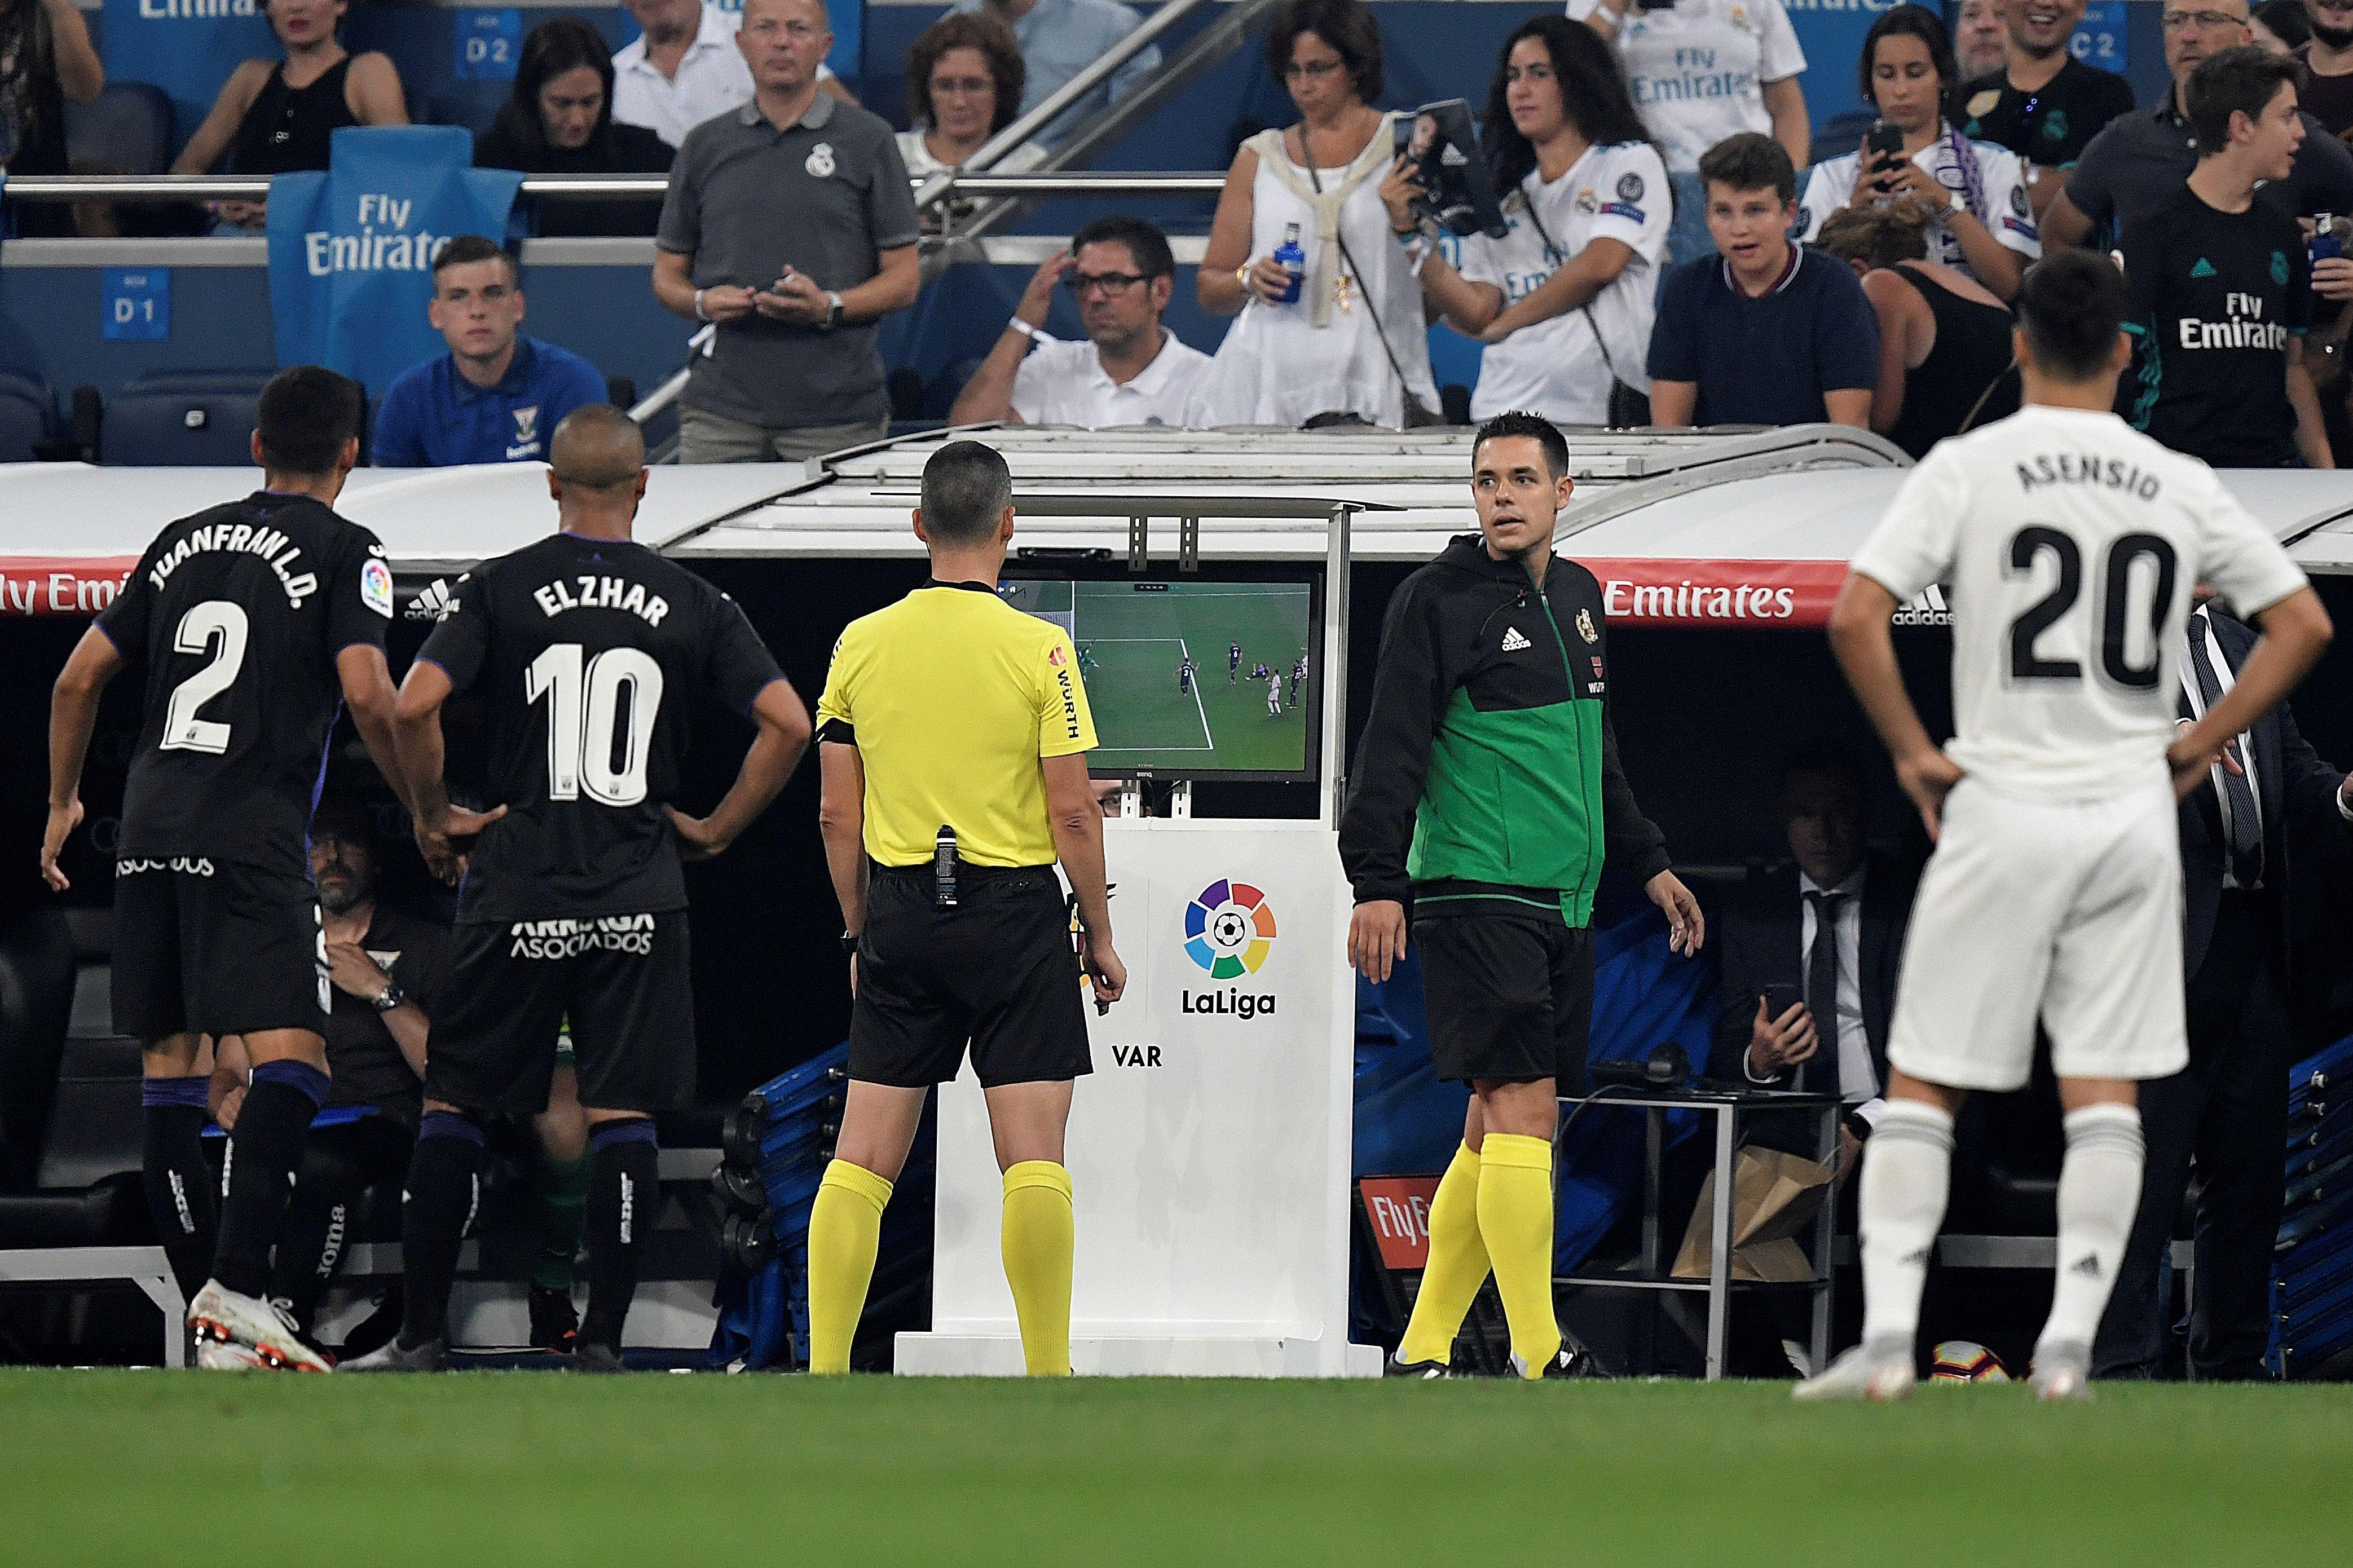 VAR has been used in La Liga since last season